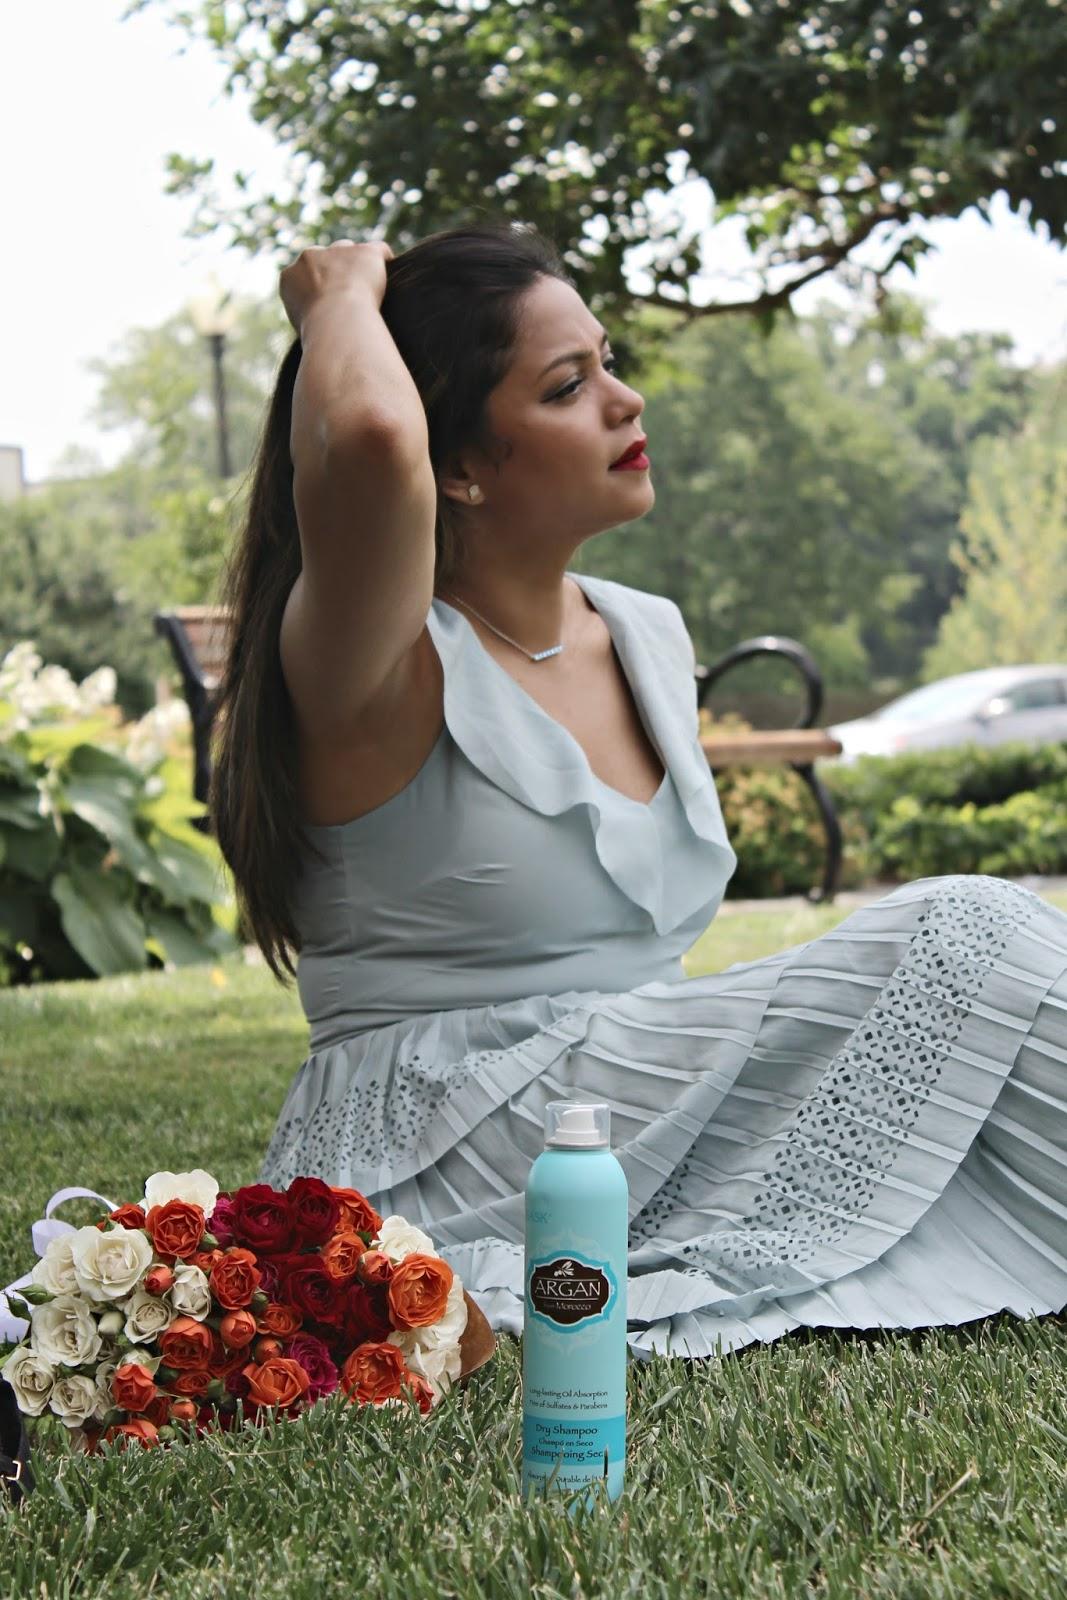 beauty products for summer, hask, dry shampoo, sponsored, beauty, hair care, eye cream, eye mask, loreal, influenster , saumya , myriad musings